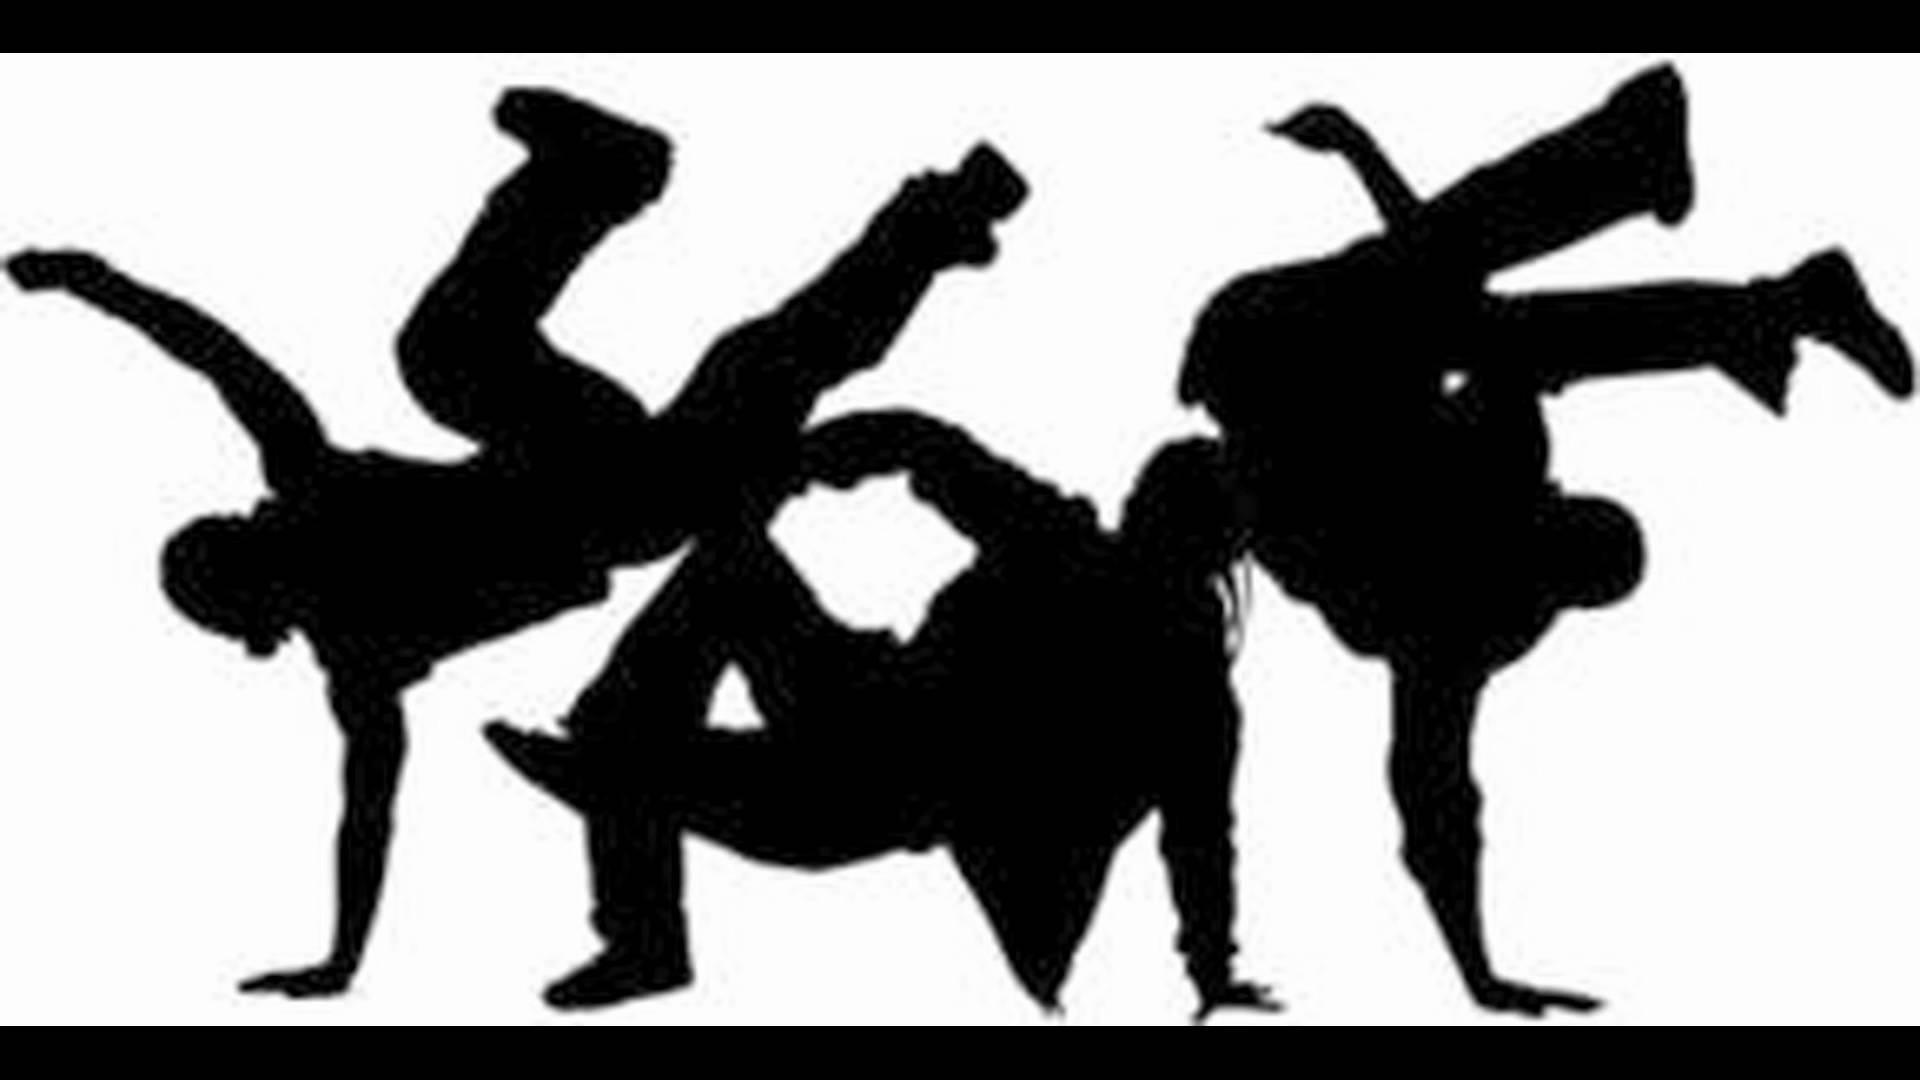 1920x1080 Street Dance Mix 002 (Schools Out Kids)